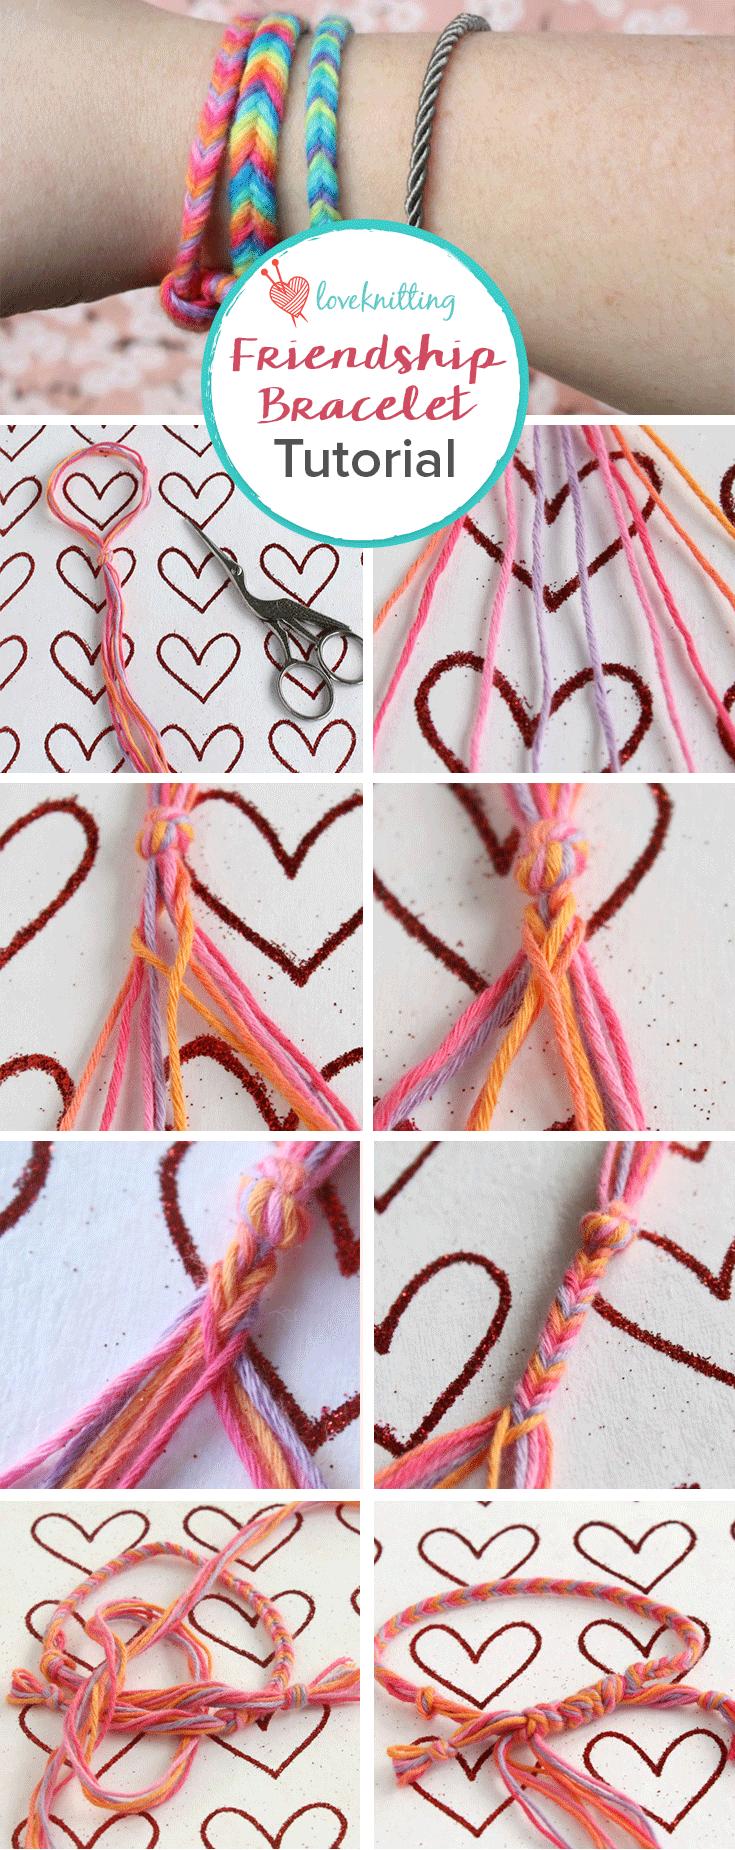 Knit by Bit: free friendship bracelet tutorial